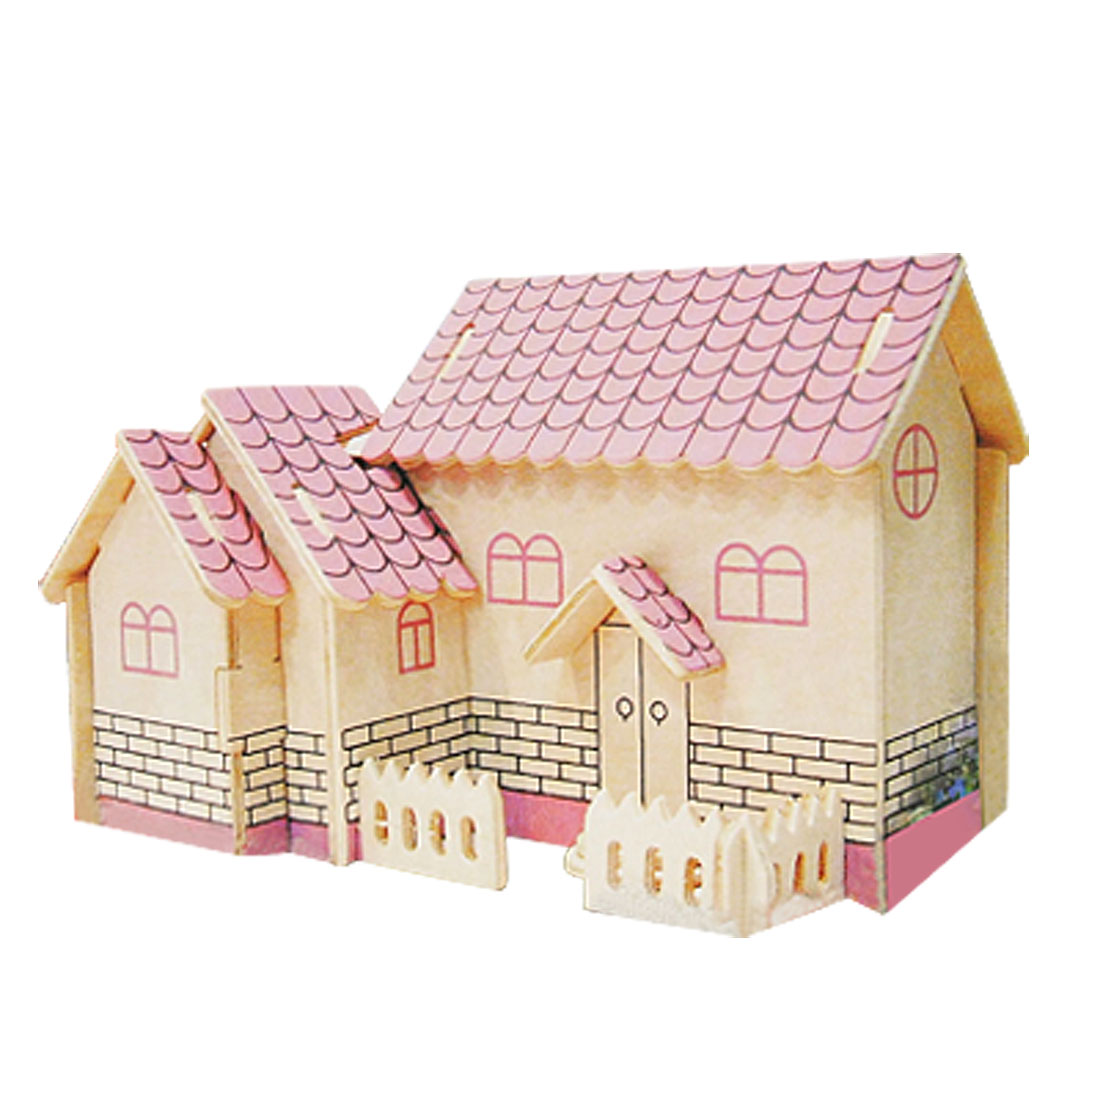 Purple House 3D Model Puzzle Toy Woodcraft Construction Kit